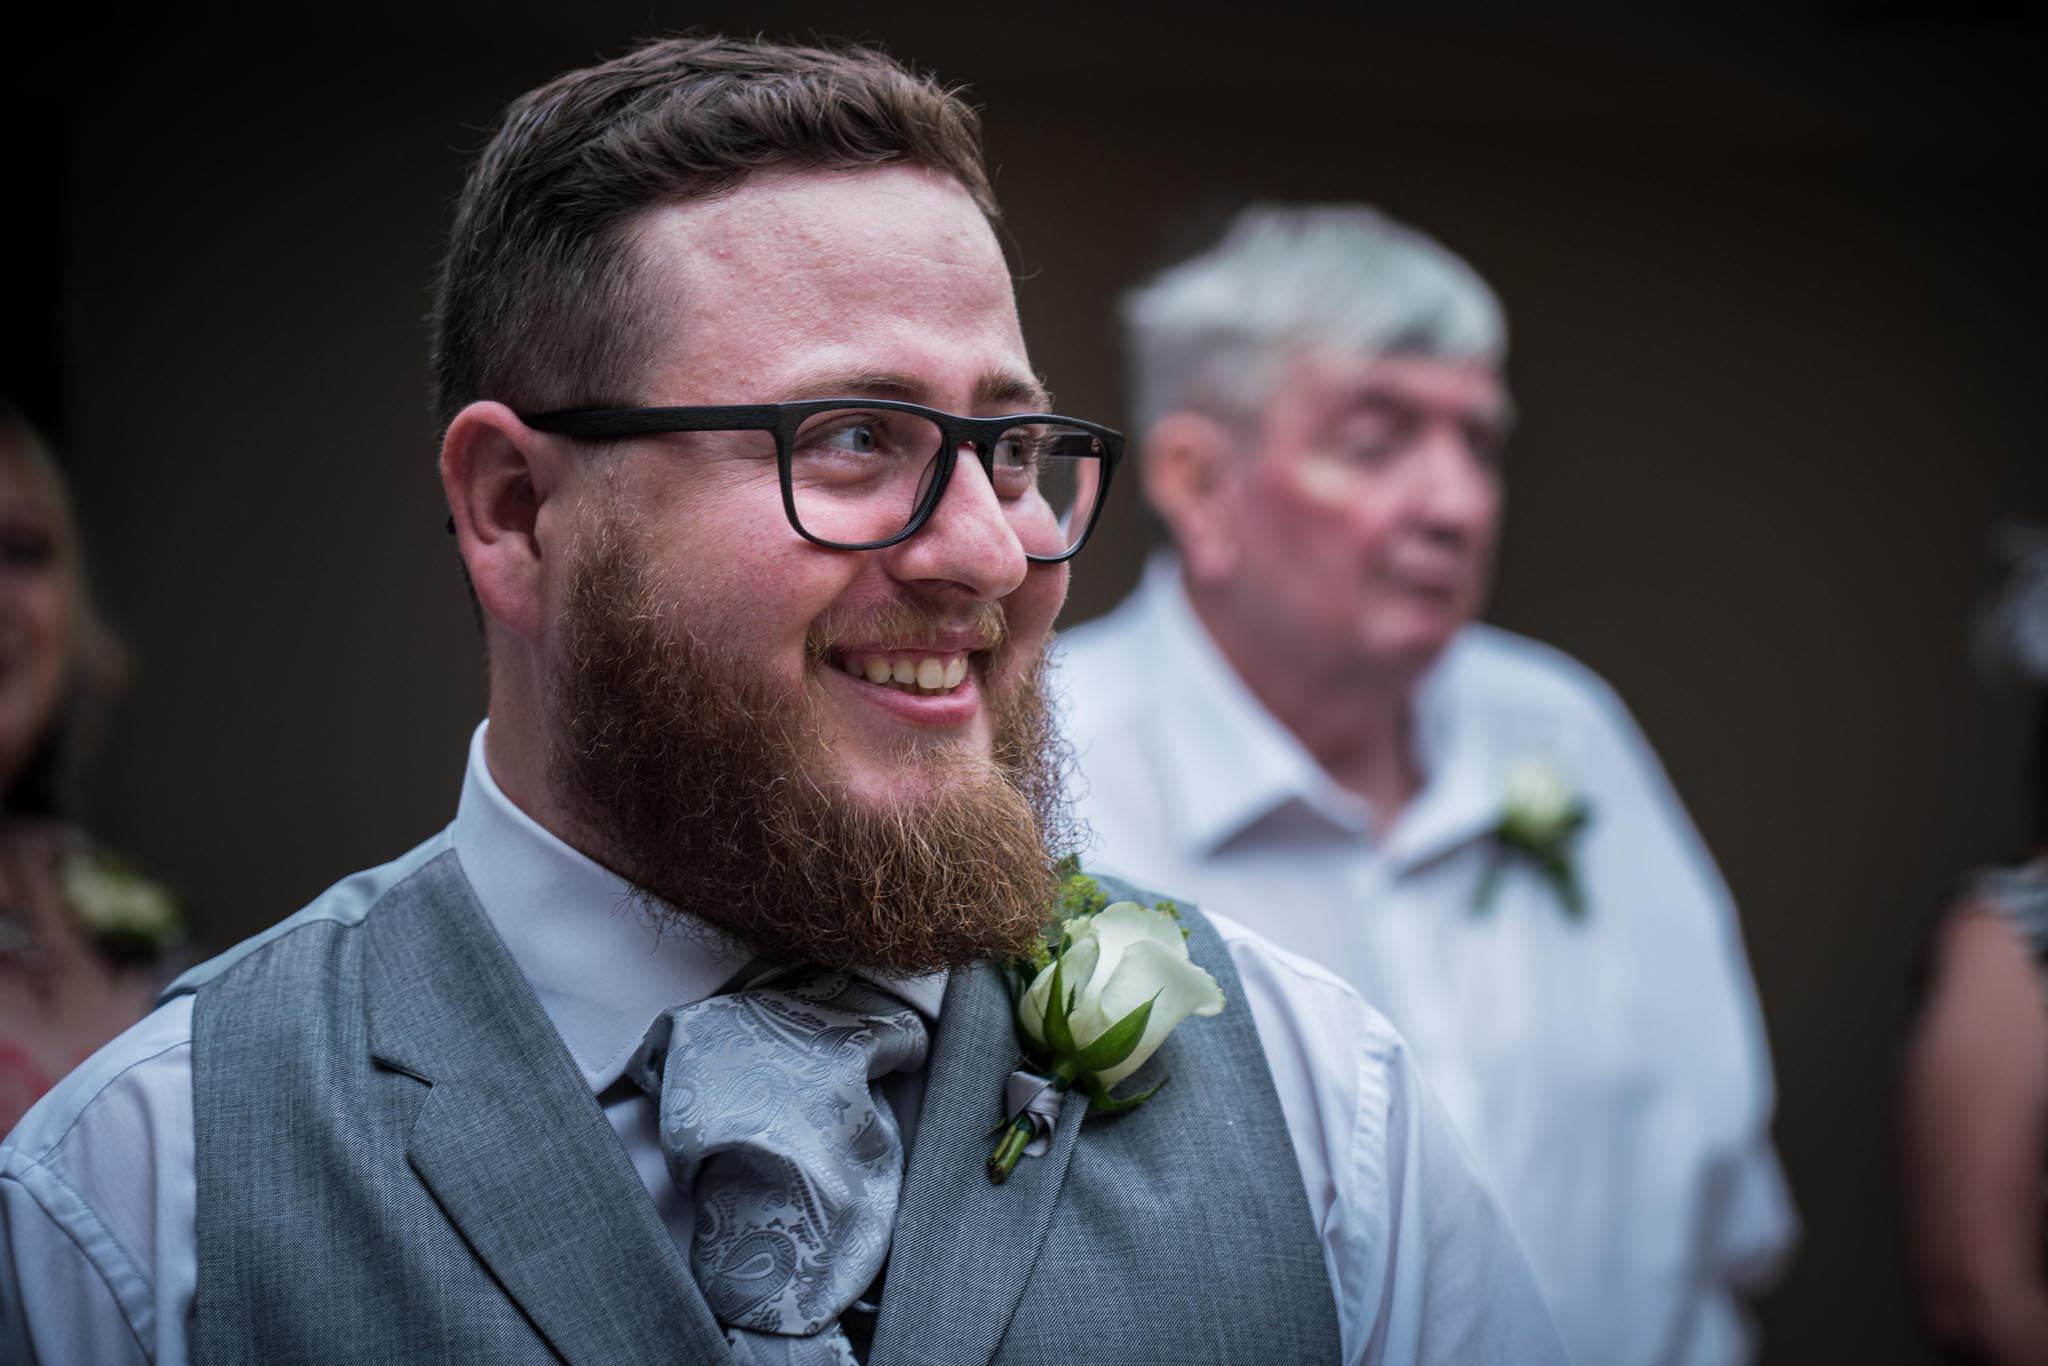 271-Ceremony-Luke-Yasmin-The-Rayleigh-Club-Wedding-Photography.jpg